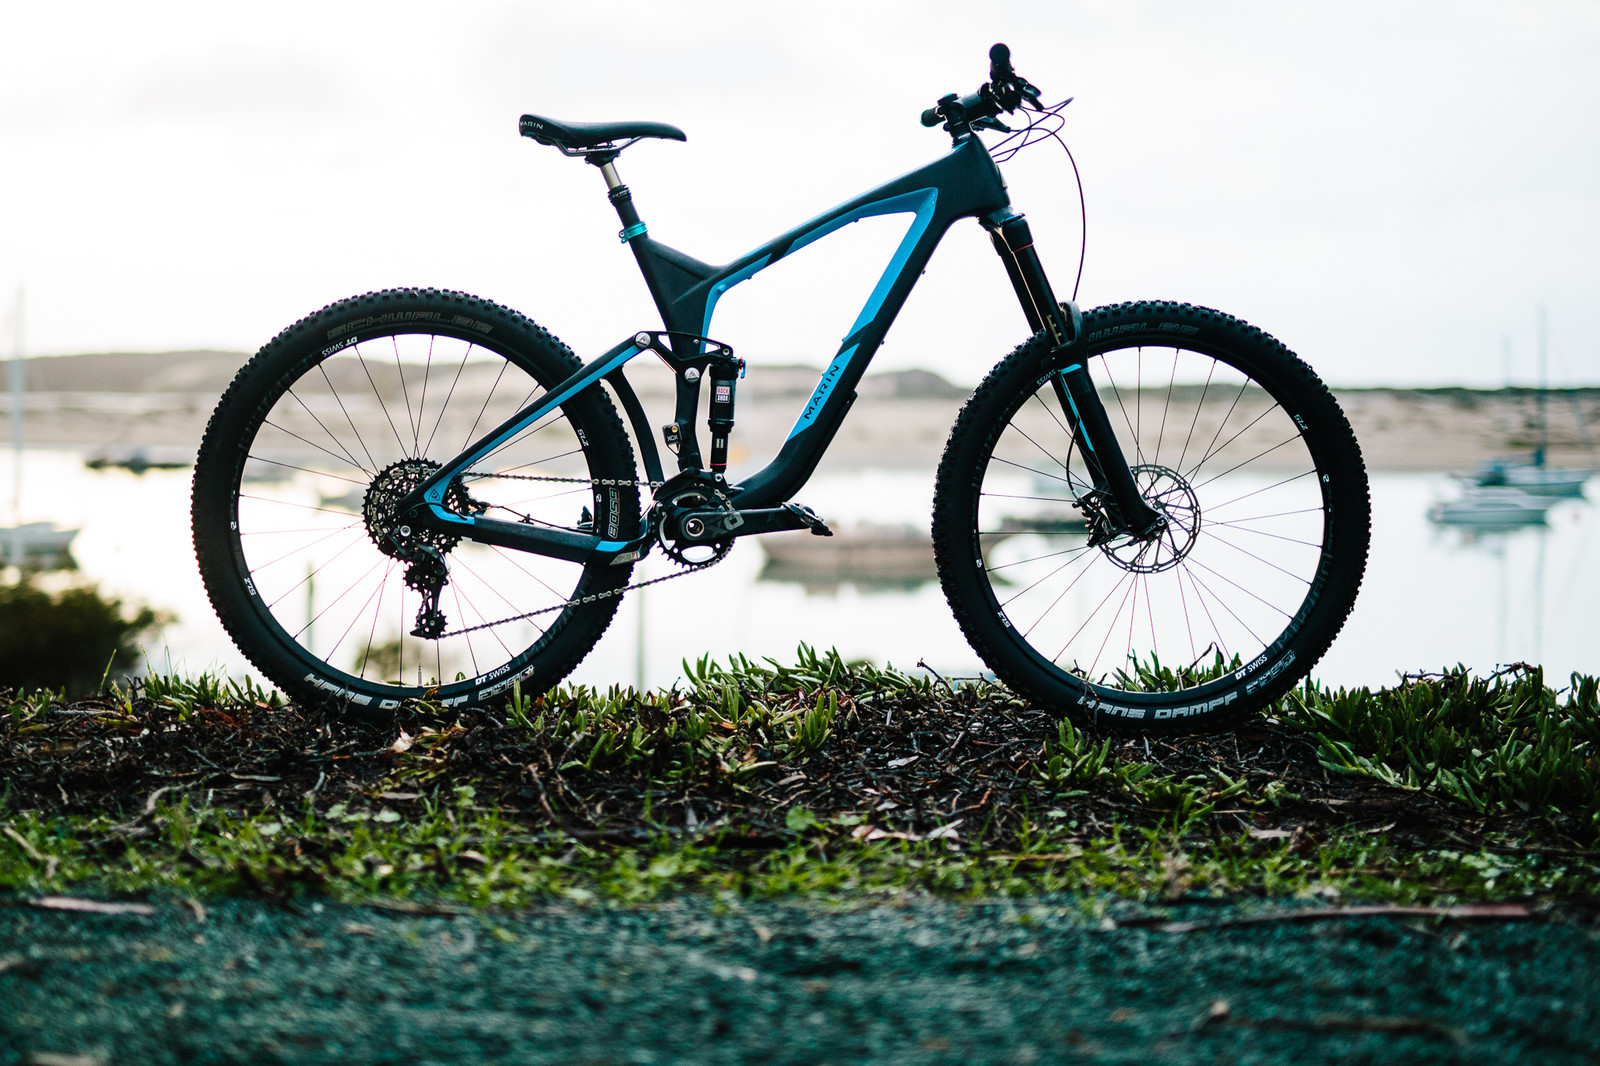 2015 Marin Attack Trail C-XT9 - 19 Bikes Tested - 2015 Vital MTB Test Sessions - Mountain Biking Pictures - Vital MTB